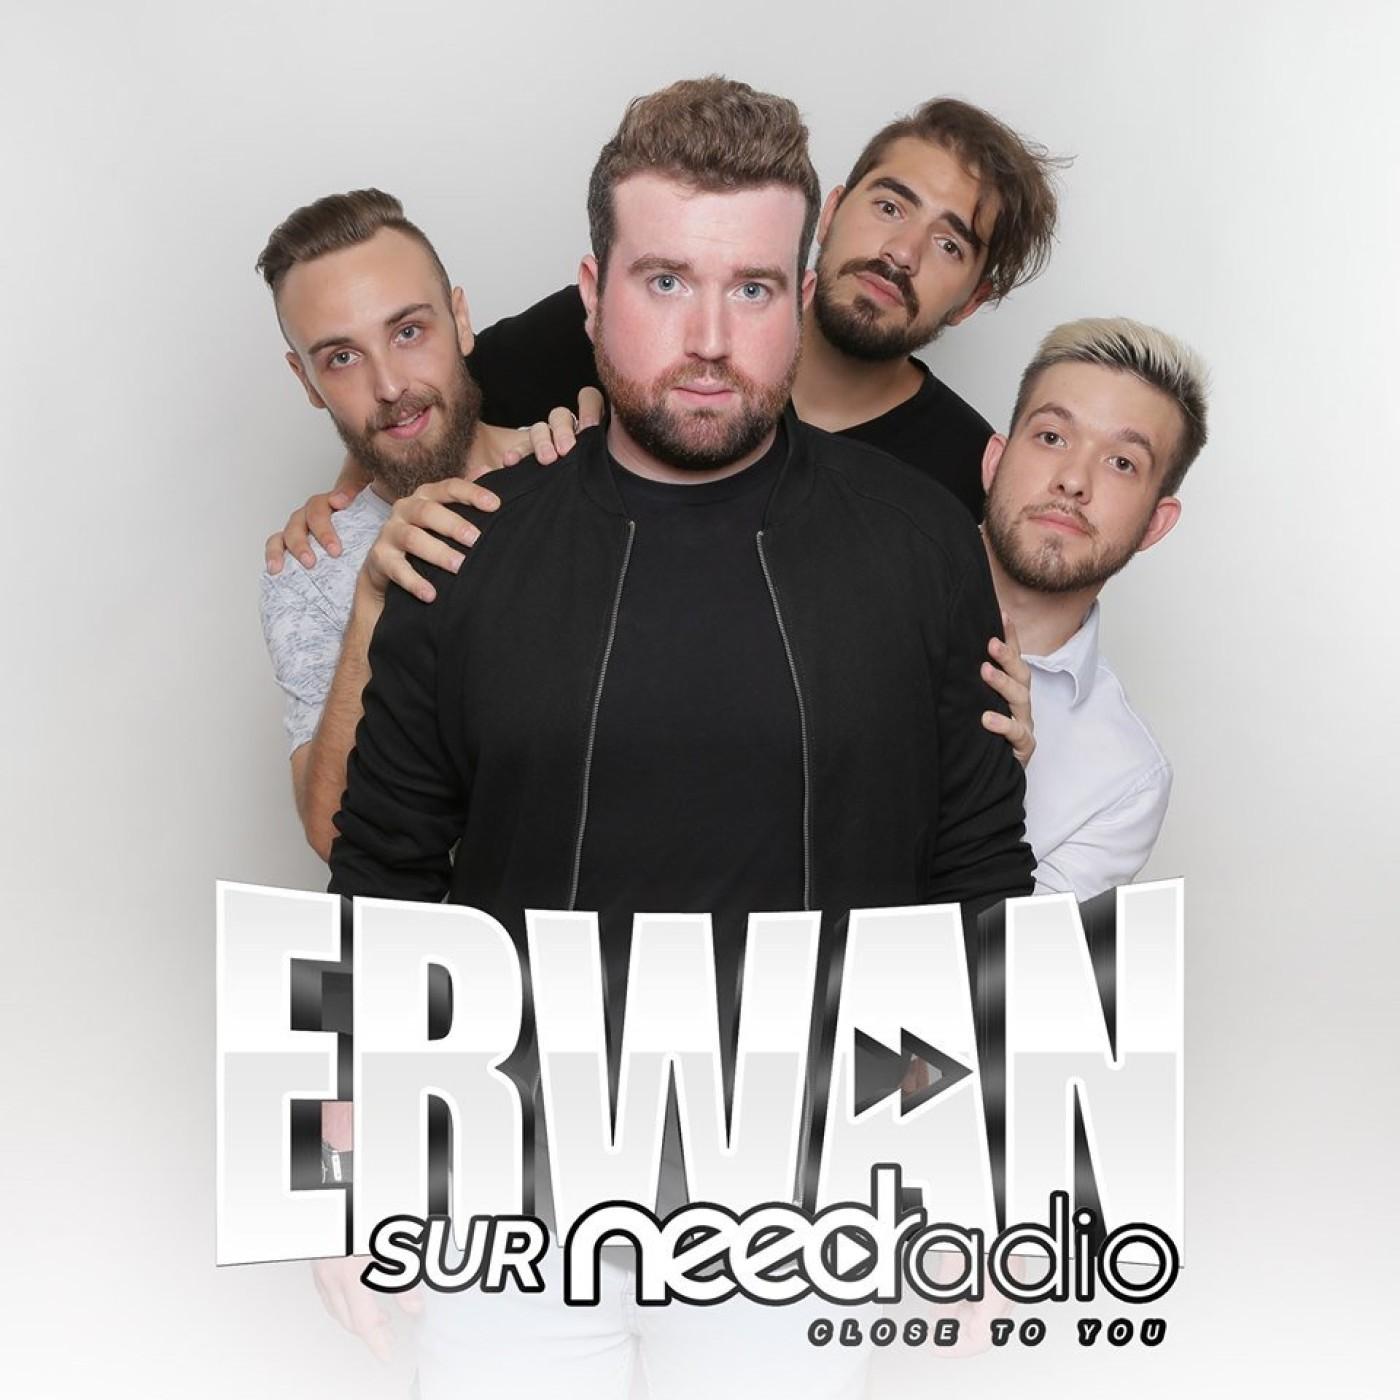 Erwan sur NEED Radio S2 #8 (AVEC GREG GUILLOTIN & KREEZY R) (01/12/19)